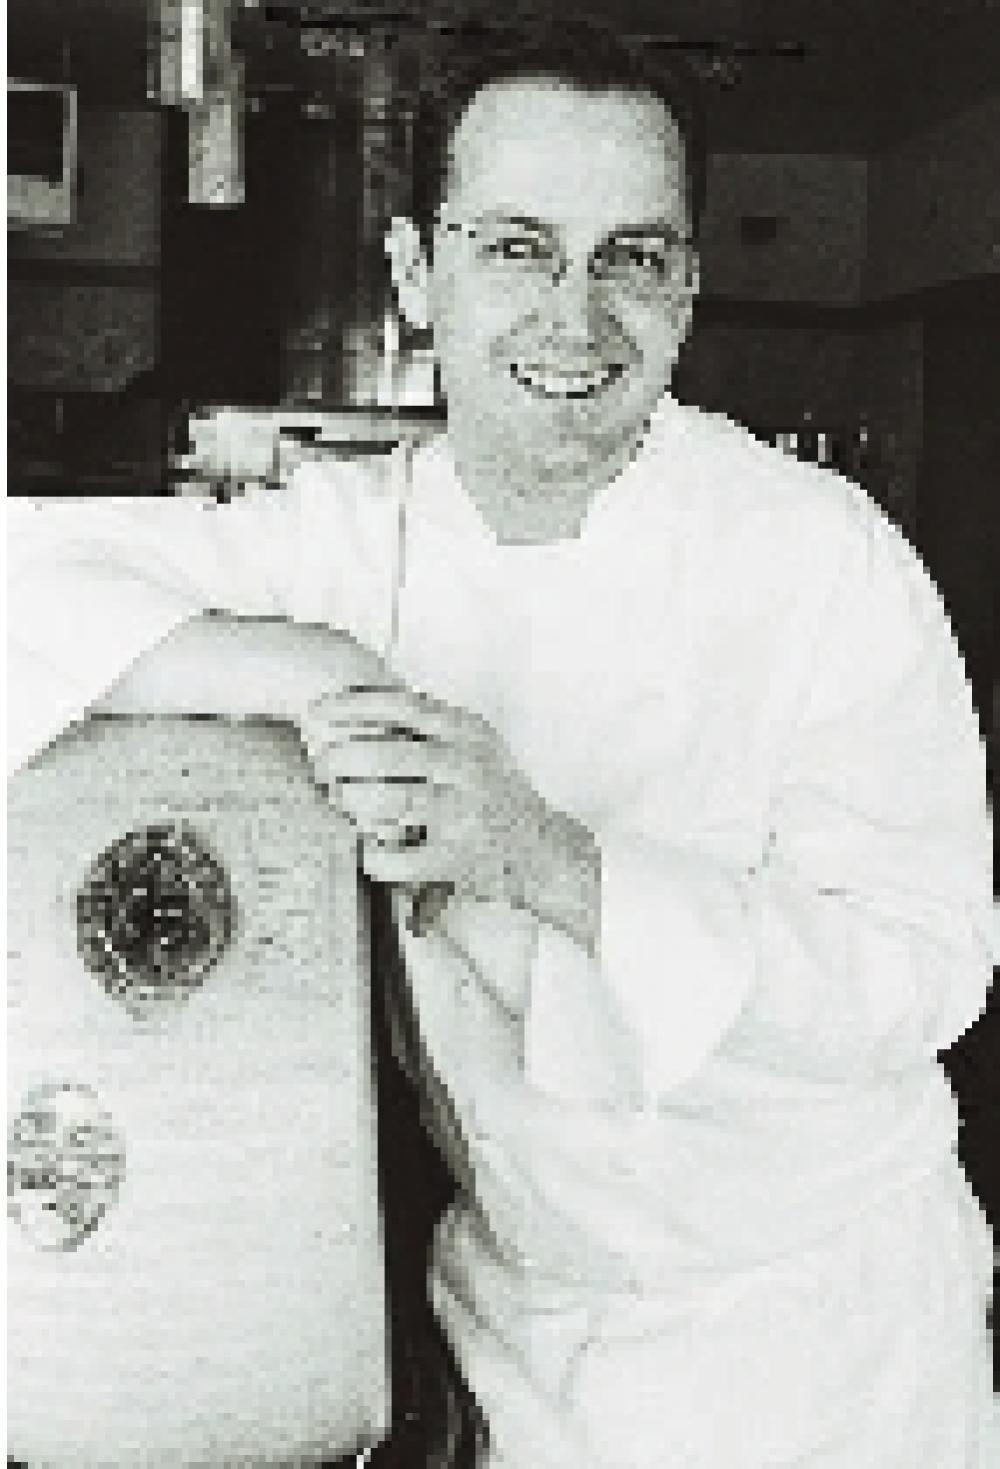 Bruce Hill, Executive Chef, Oritalia, San Francisco, CA